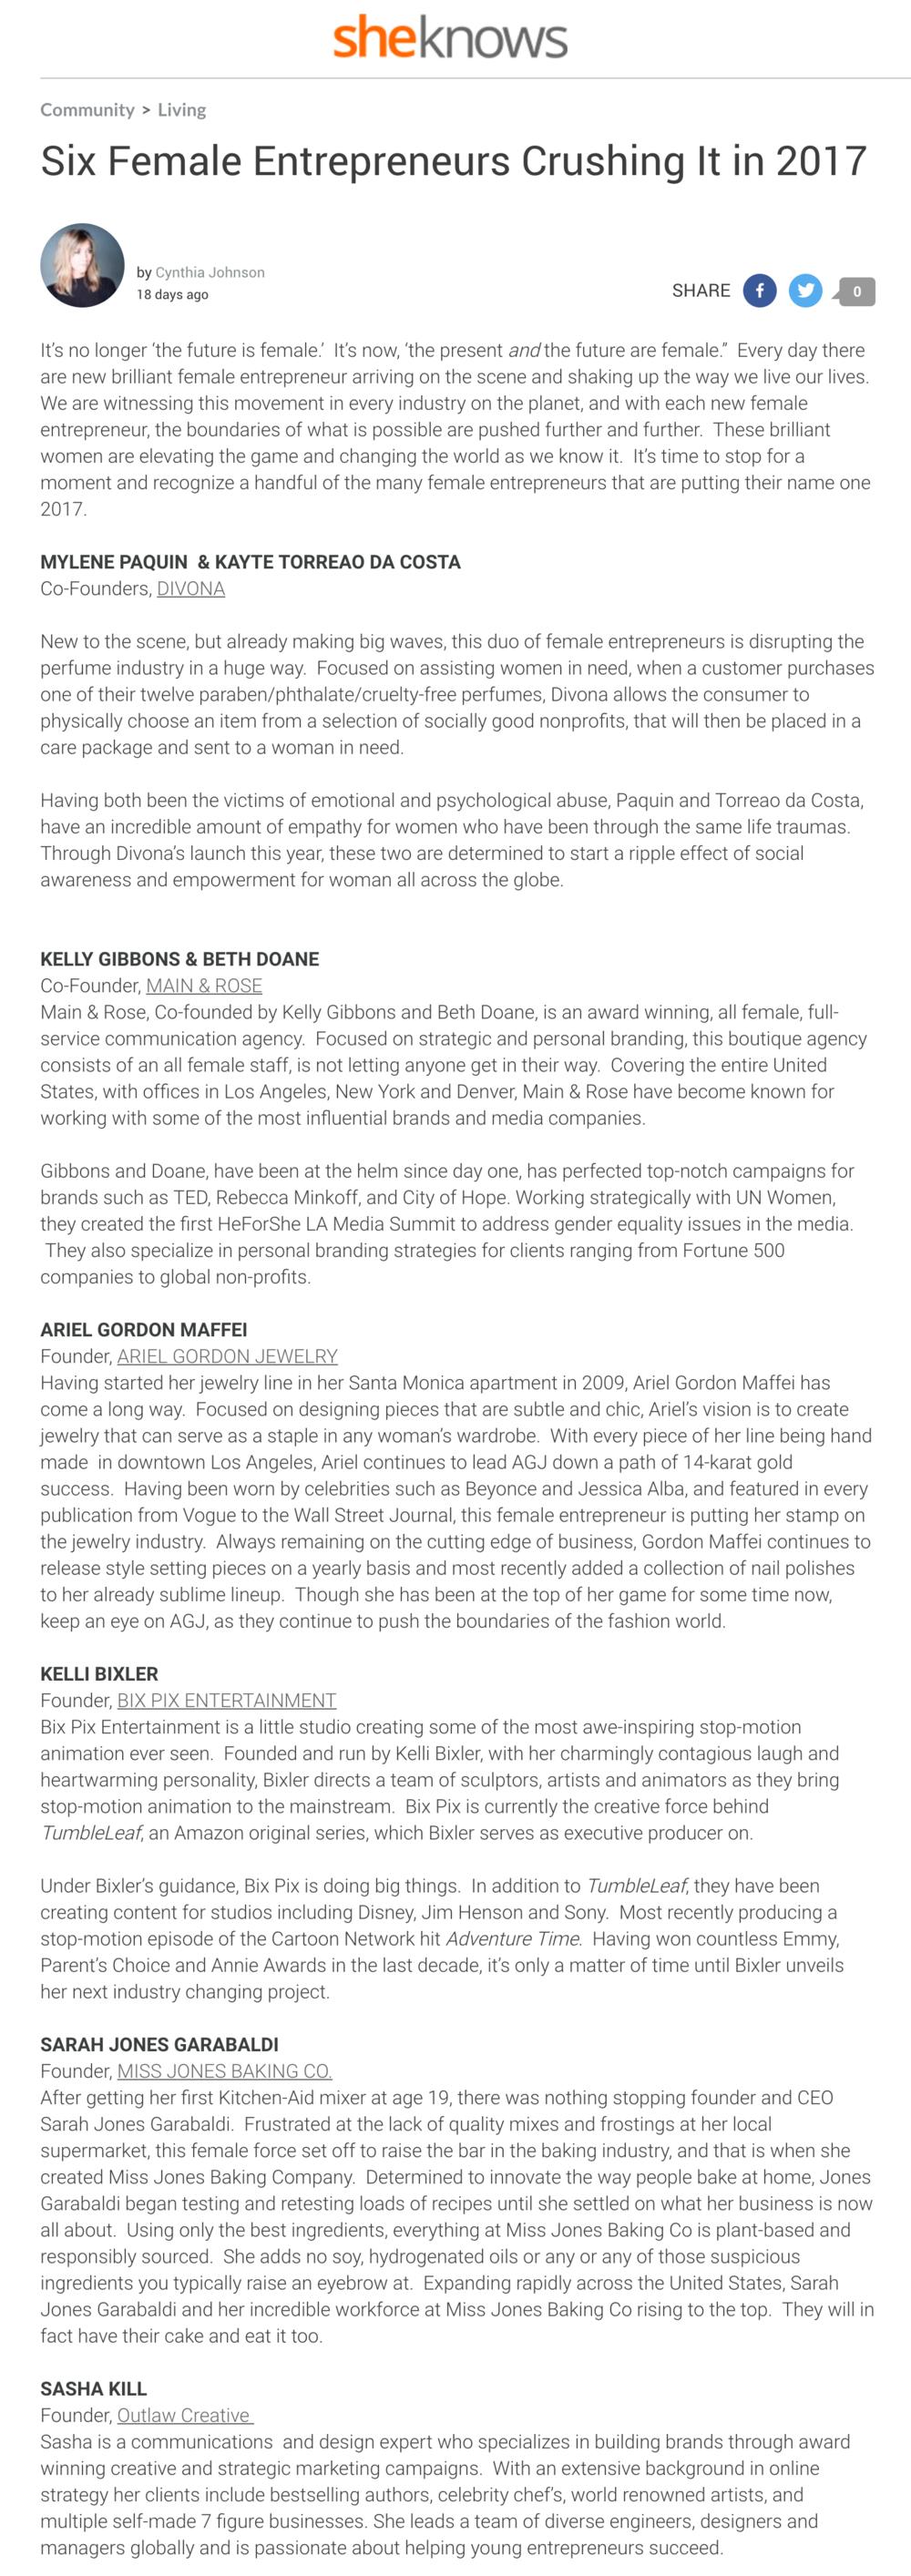 screencapture-sheknows-community-living-five-female-entrepreneurs-crushing-it-2017-1494888560162.png